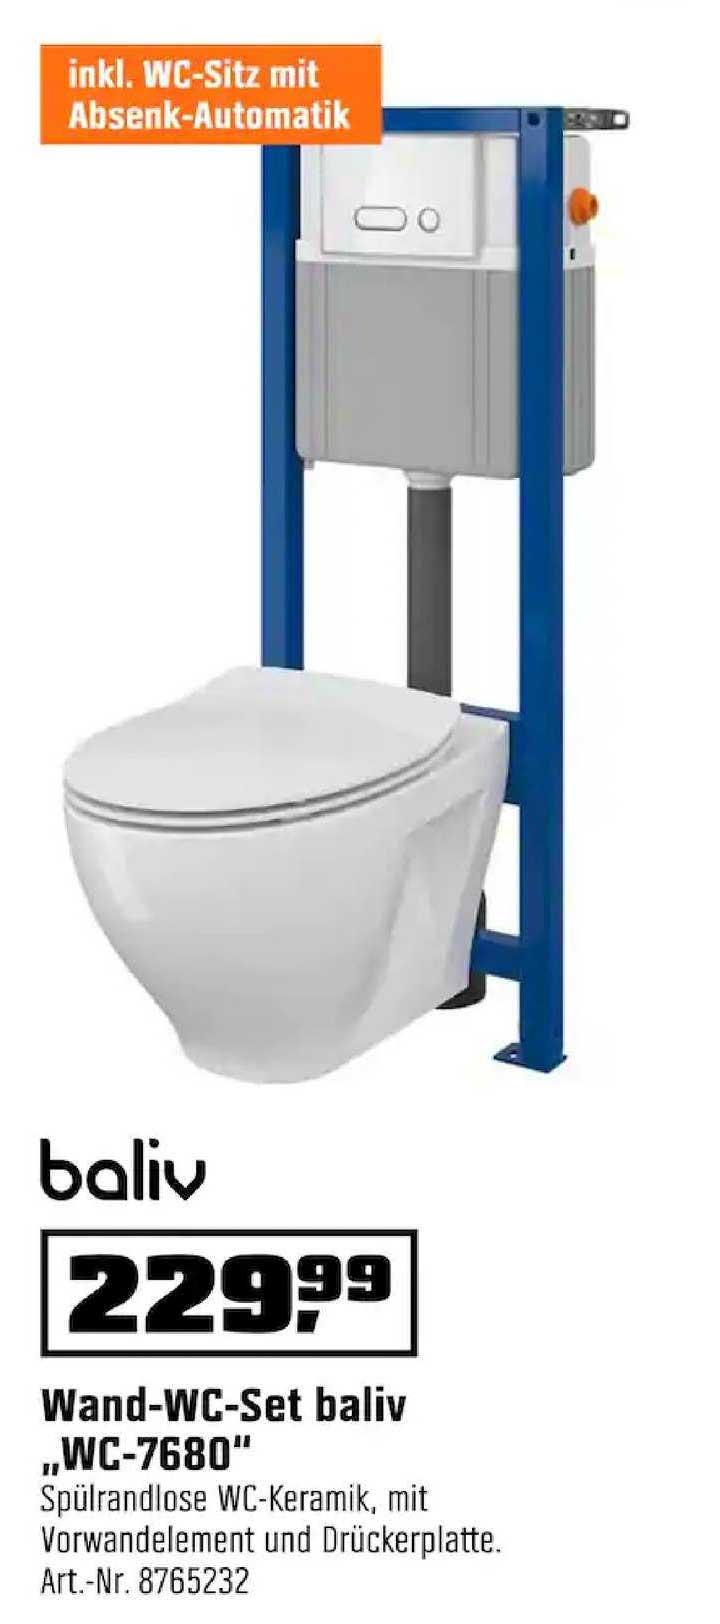 OBI Wand-wc-set Baliv Wc-7680